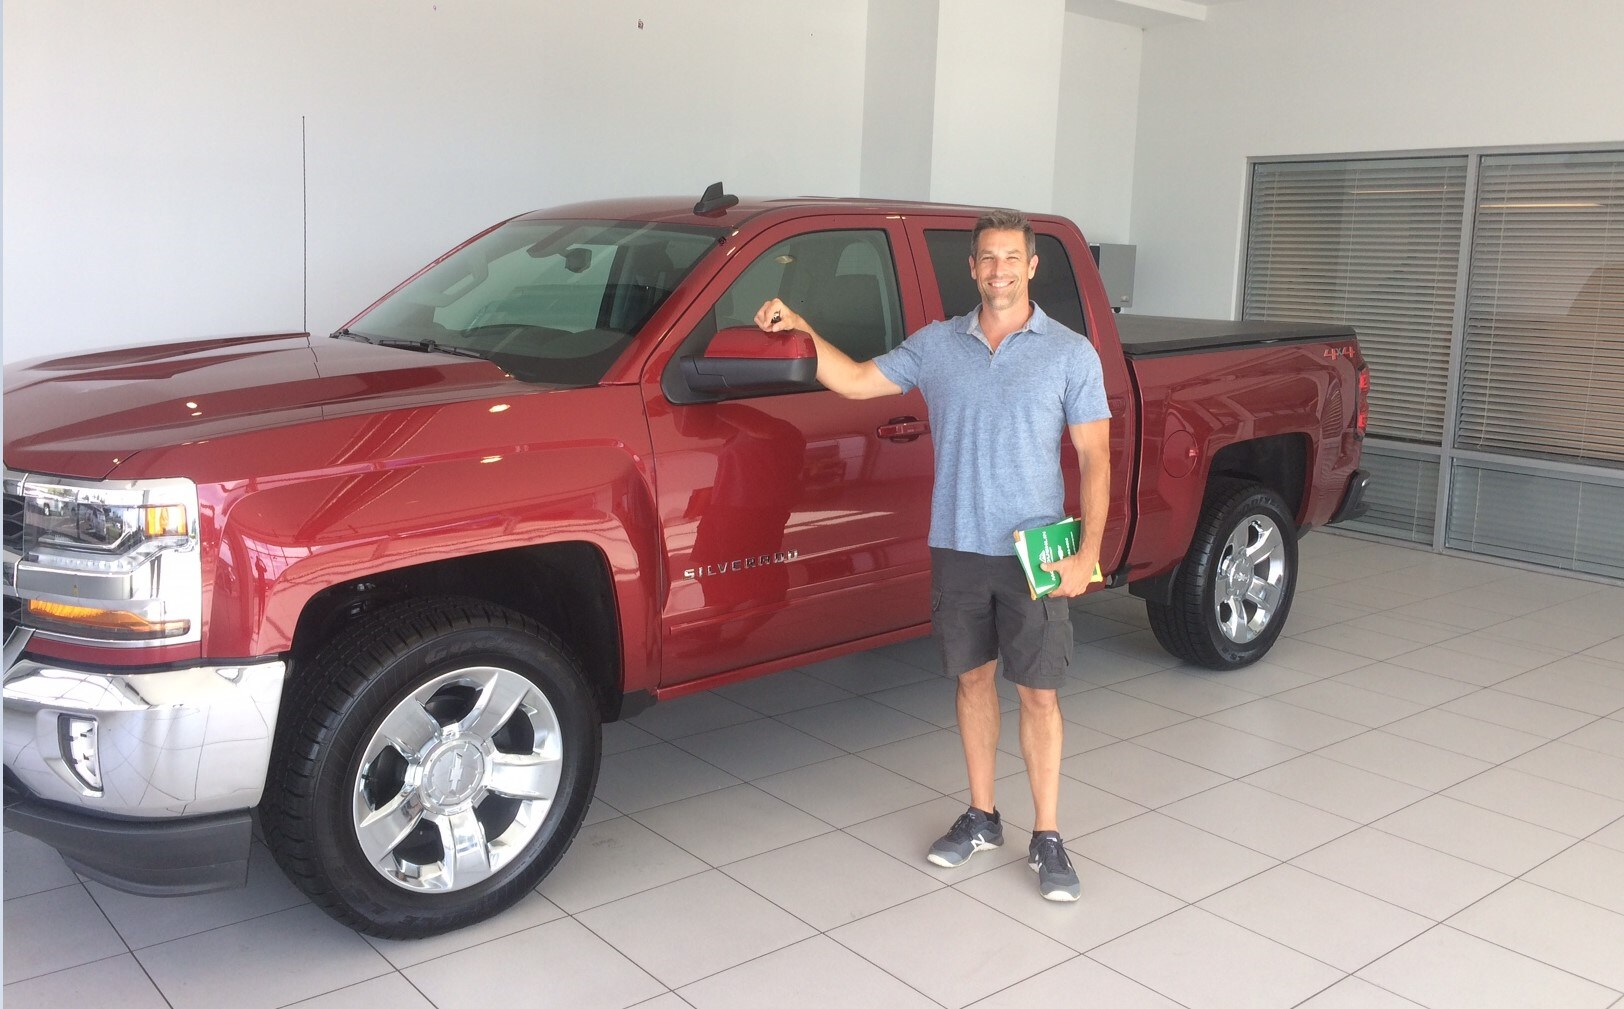 A Happy Brand-New Silverado 2018 Truck Buyer at McLoughlin Chevrolet